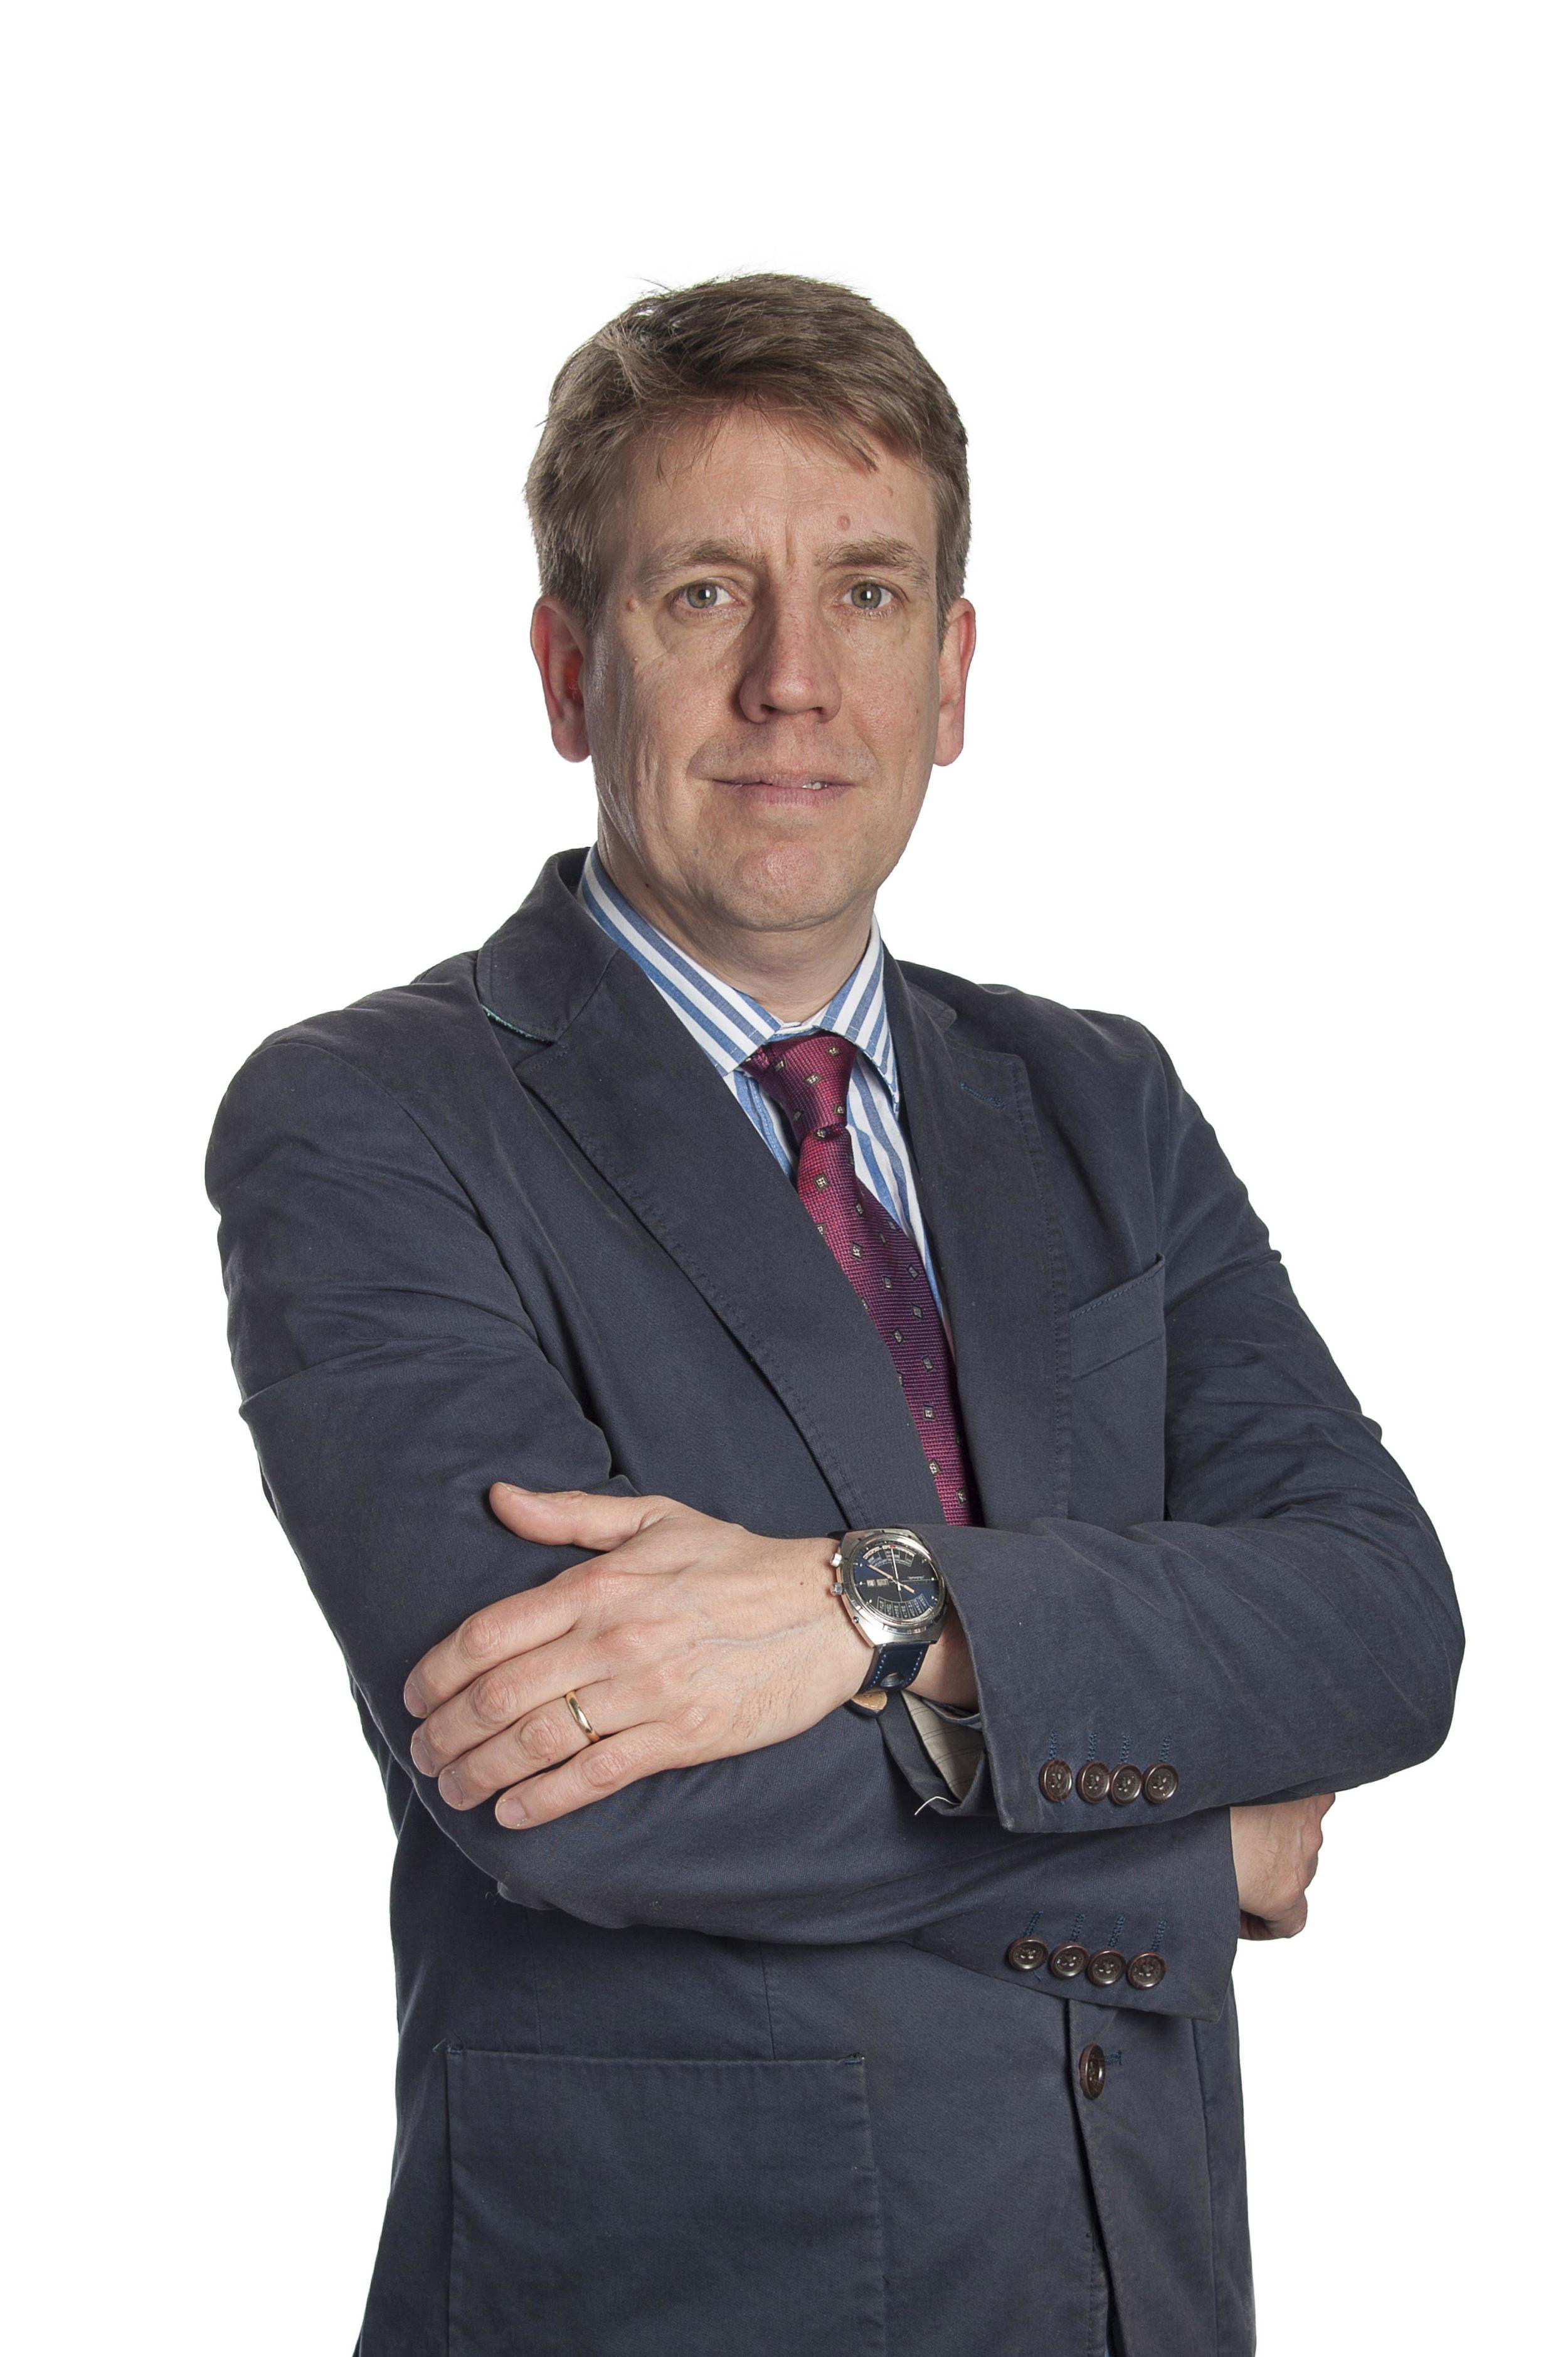 Rory McEvoy